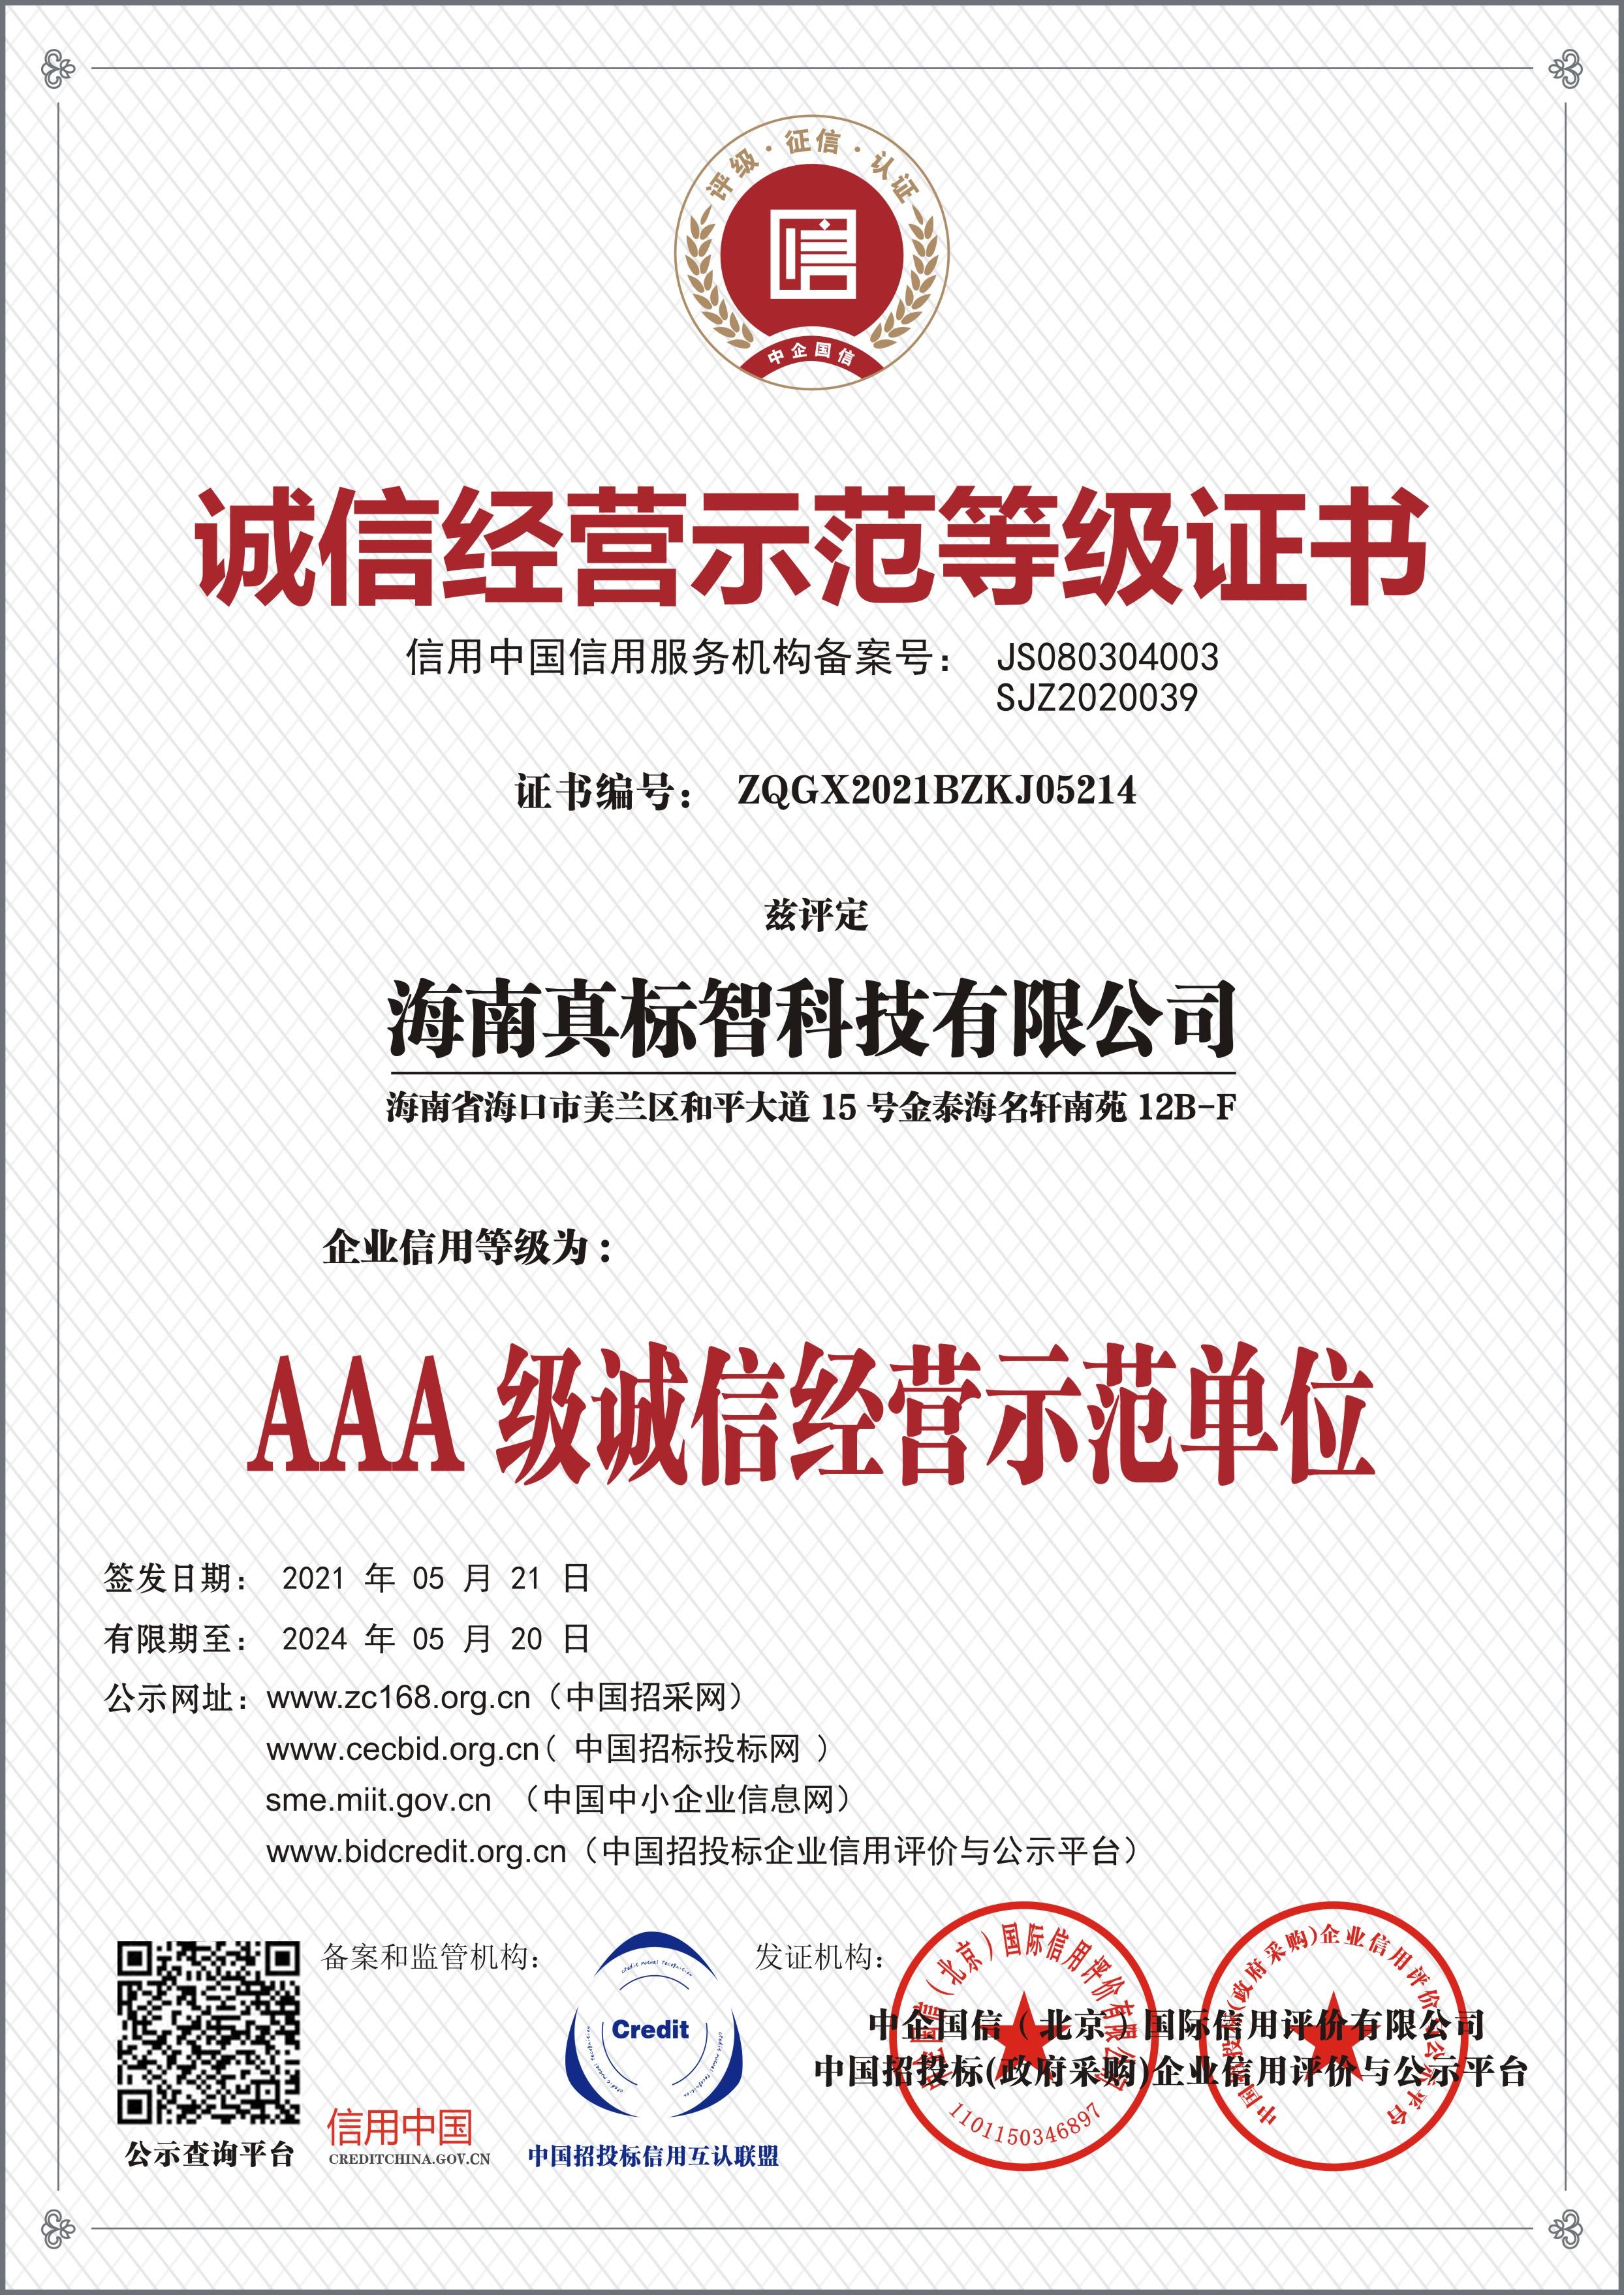 AAA誠信經營示范等級證書.jpg